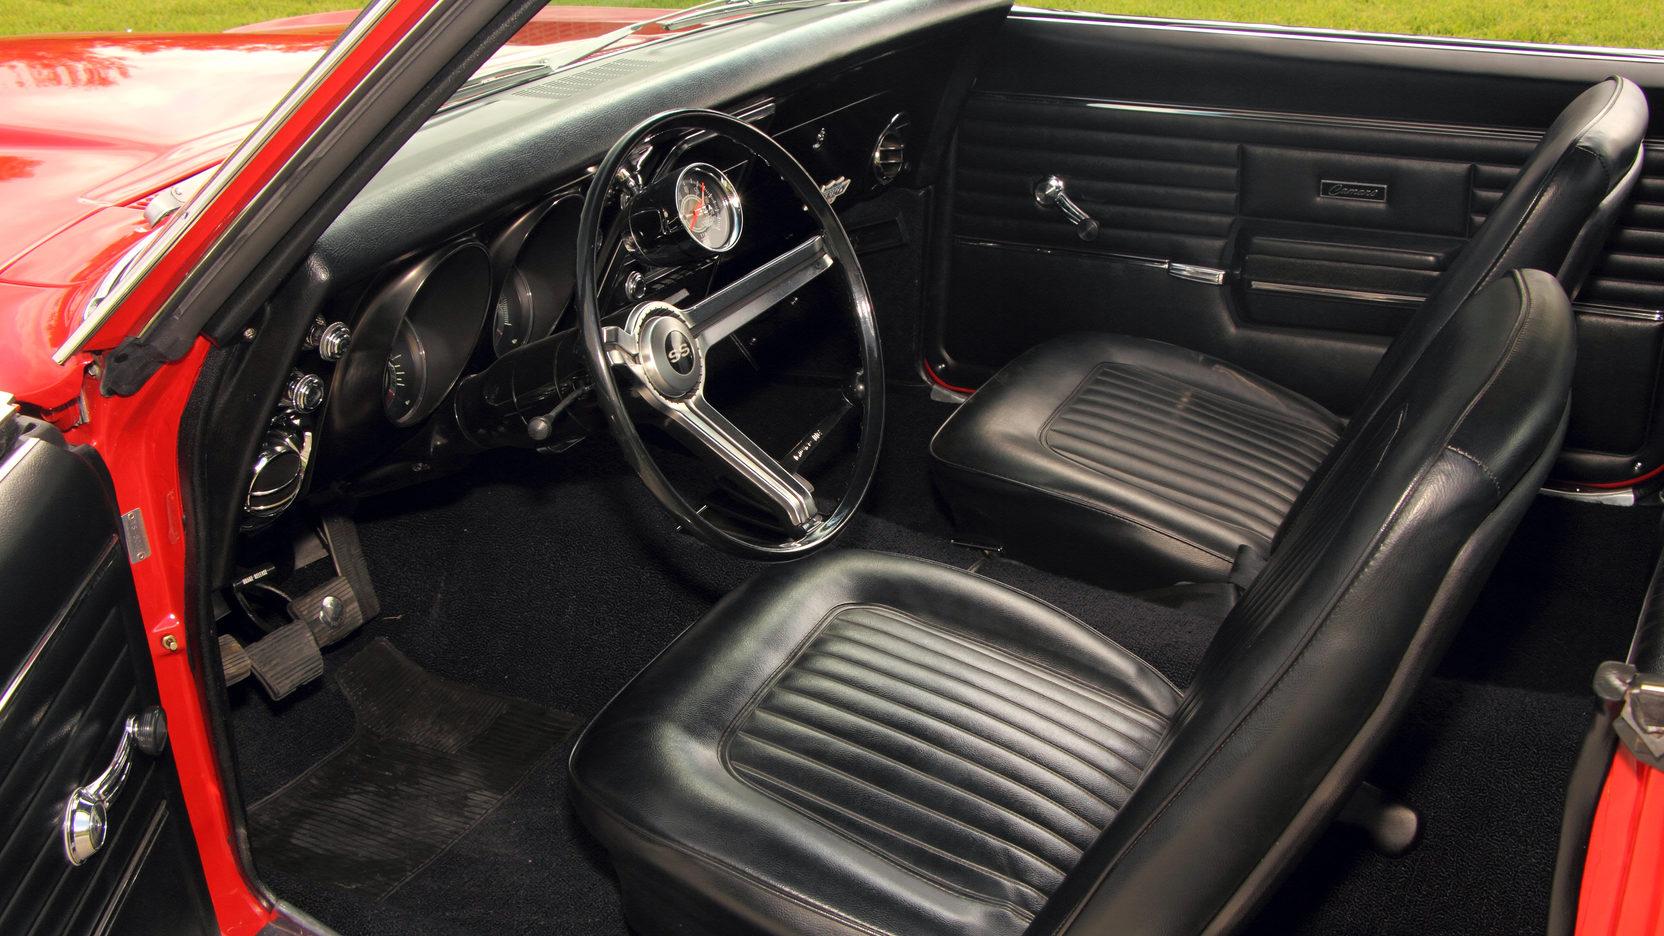 1968 Yenko Chevrolet Camaro Interior